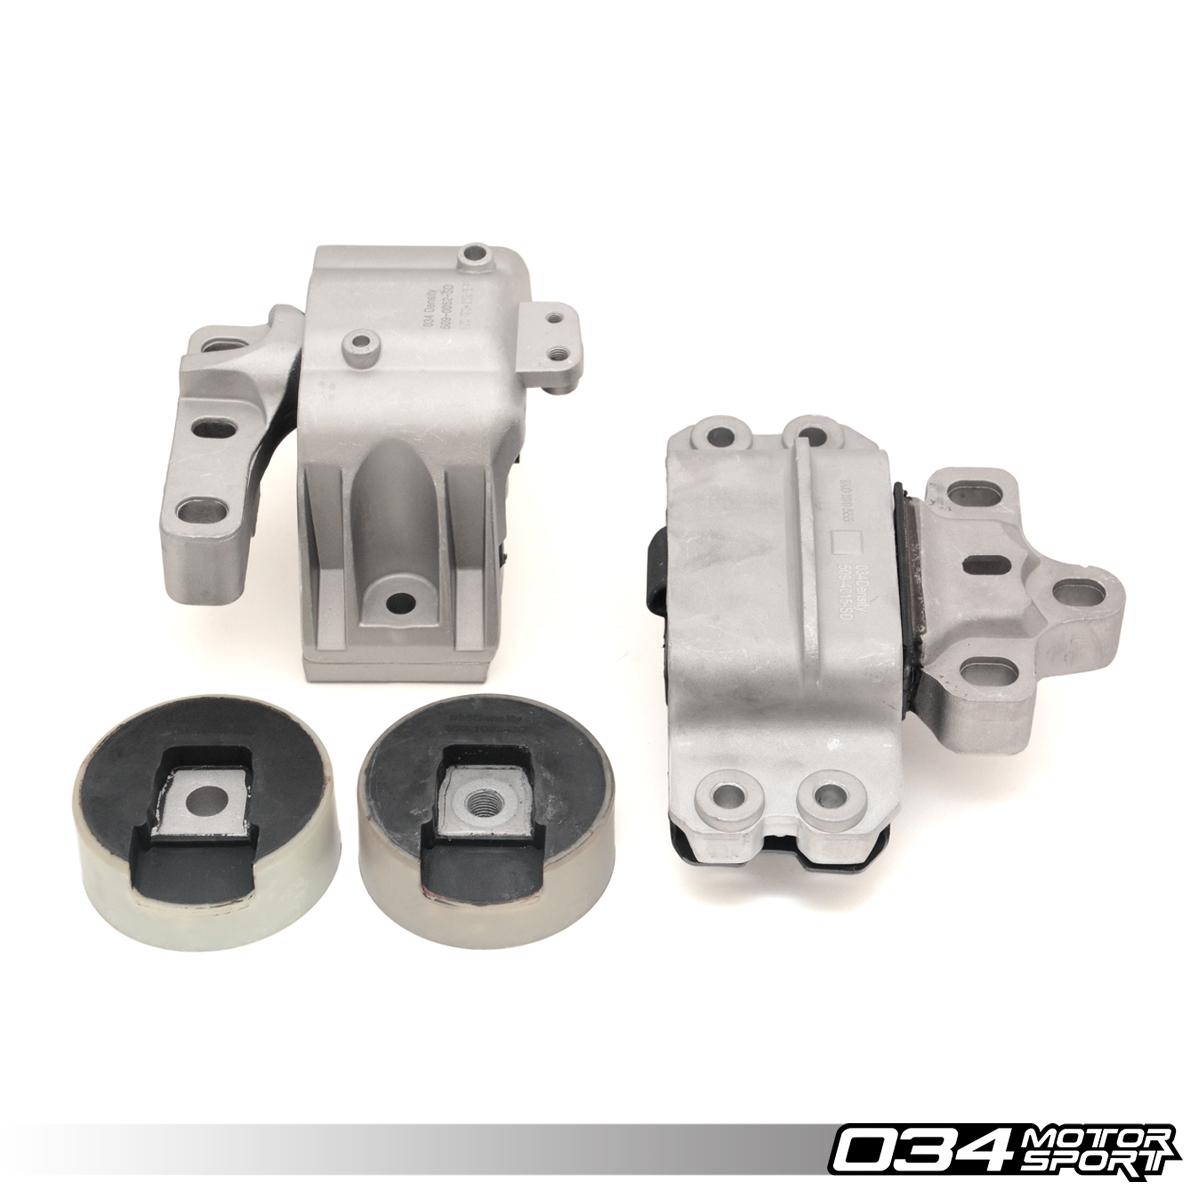 1996 Jetta Vr6 Engine Diagram Motor Mount Set Density Line Mkv Amp Mkvi Volkswagen 8j